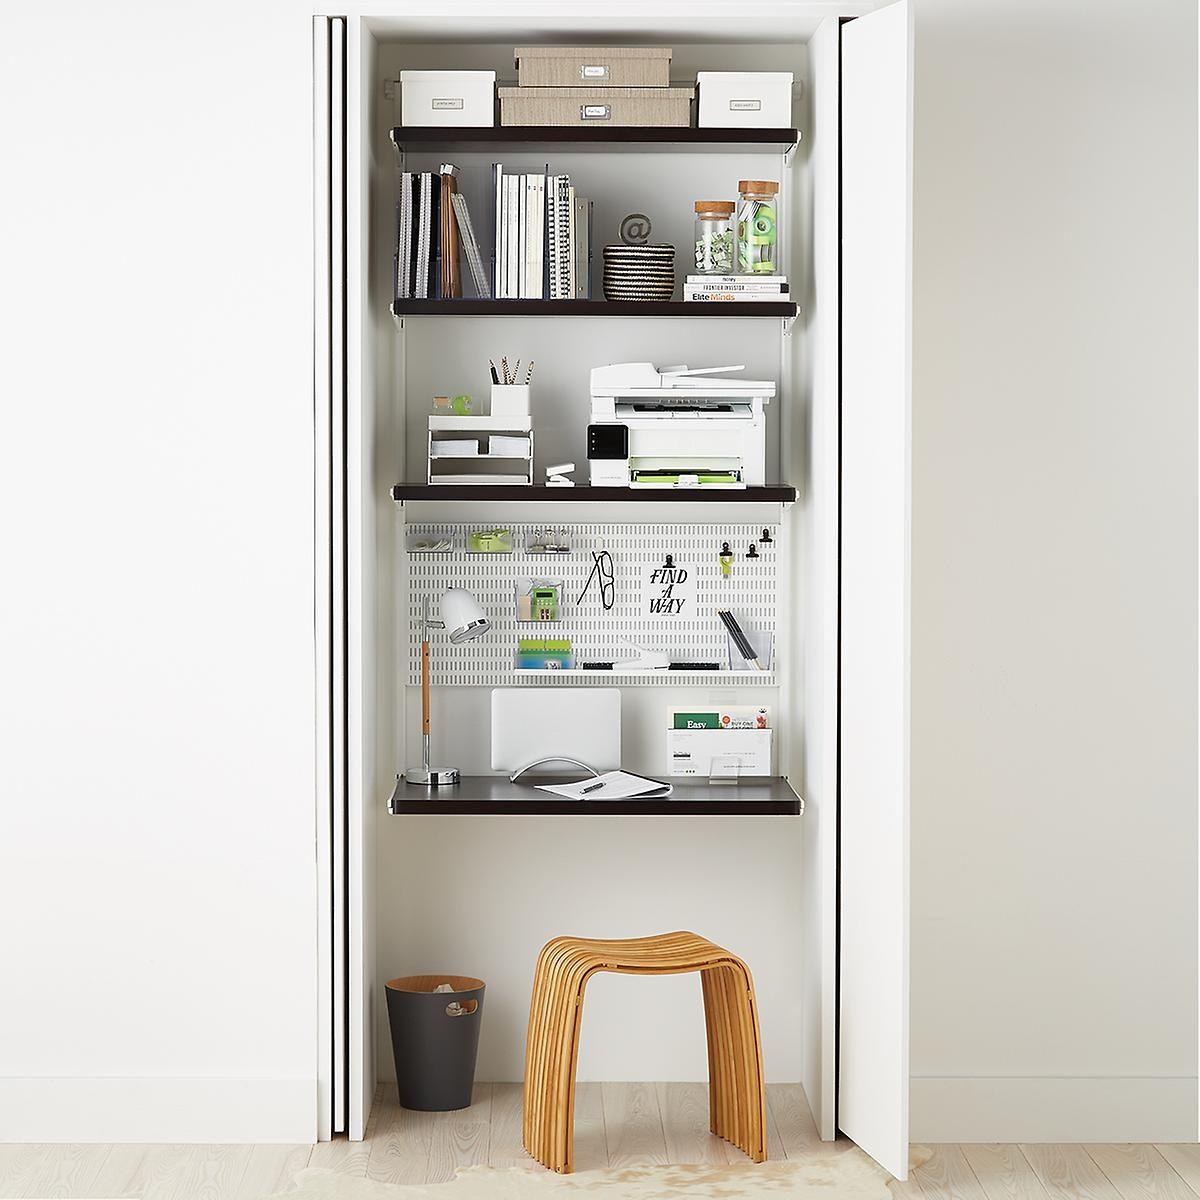 Elfa Decor Walnut White Nook Wall Storage Shelves Office Shelving Asian Home Decor